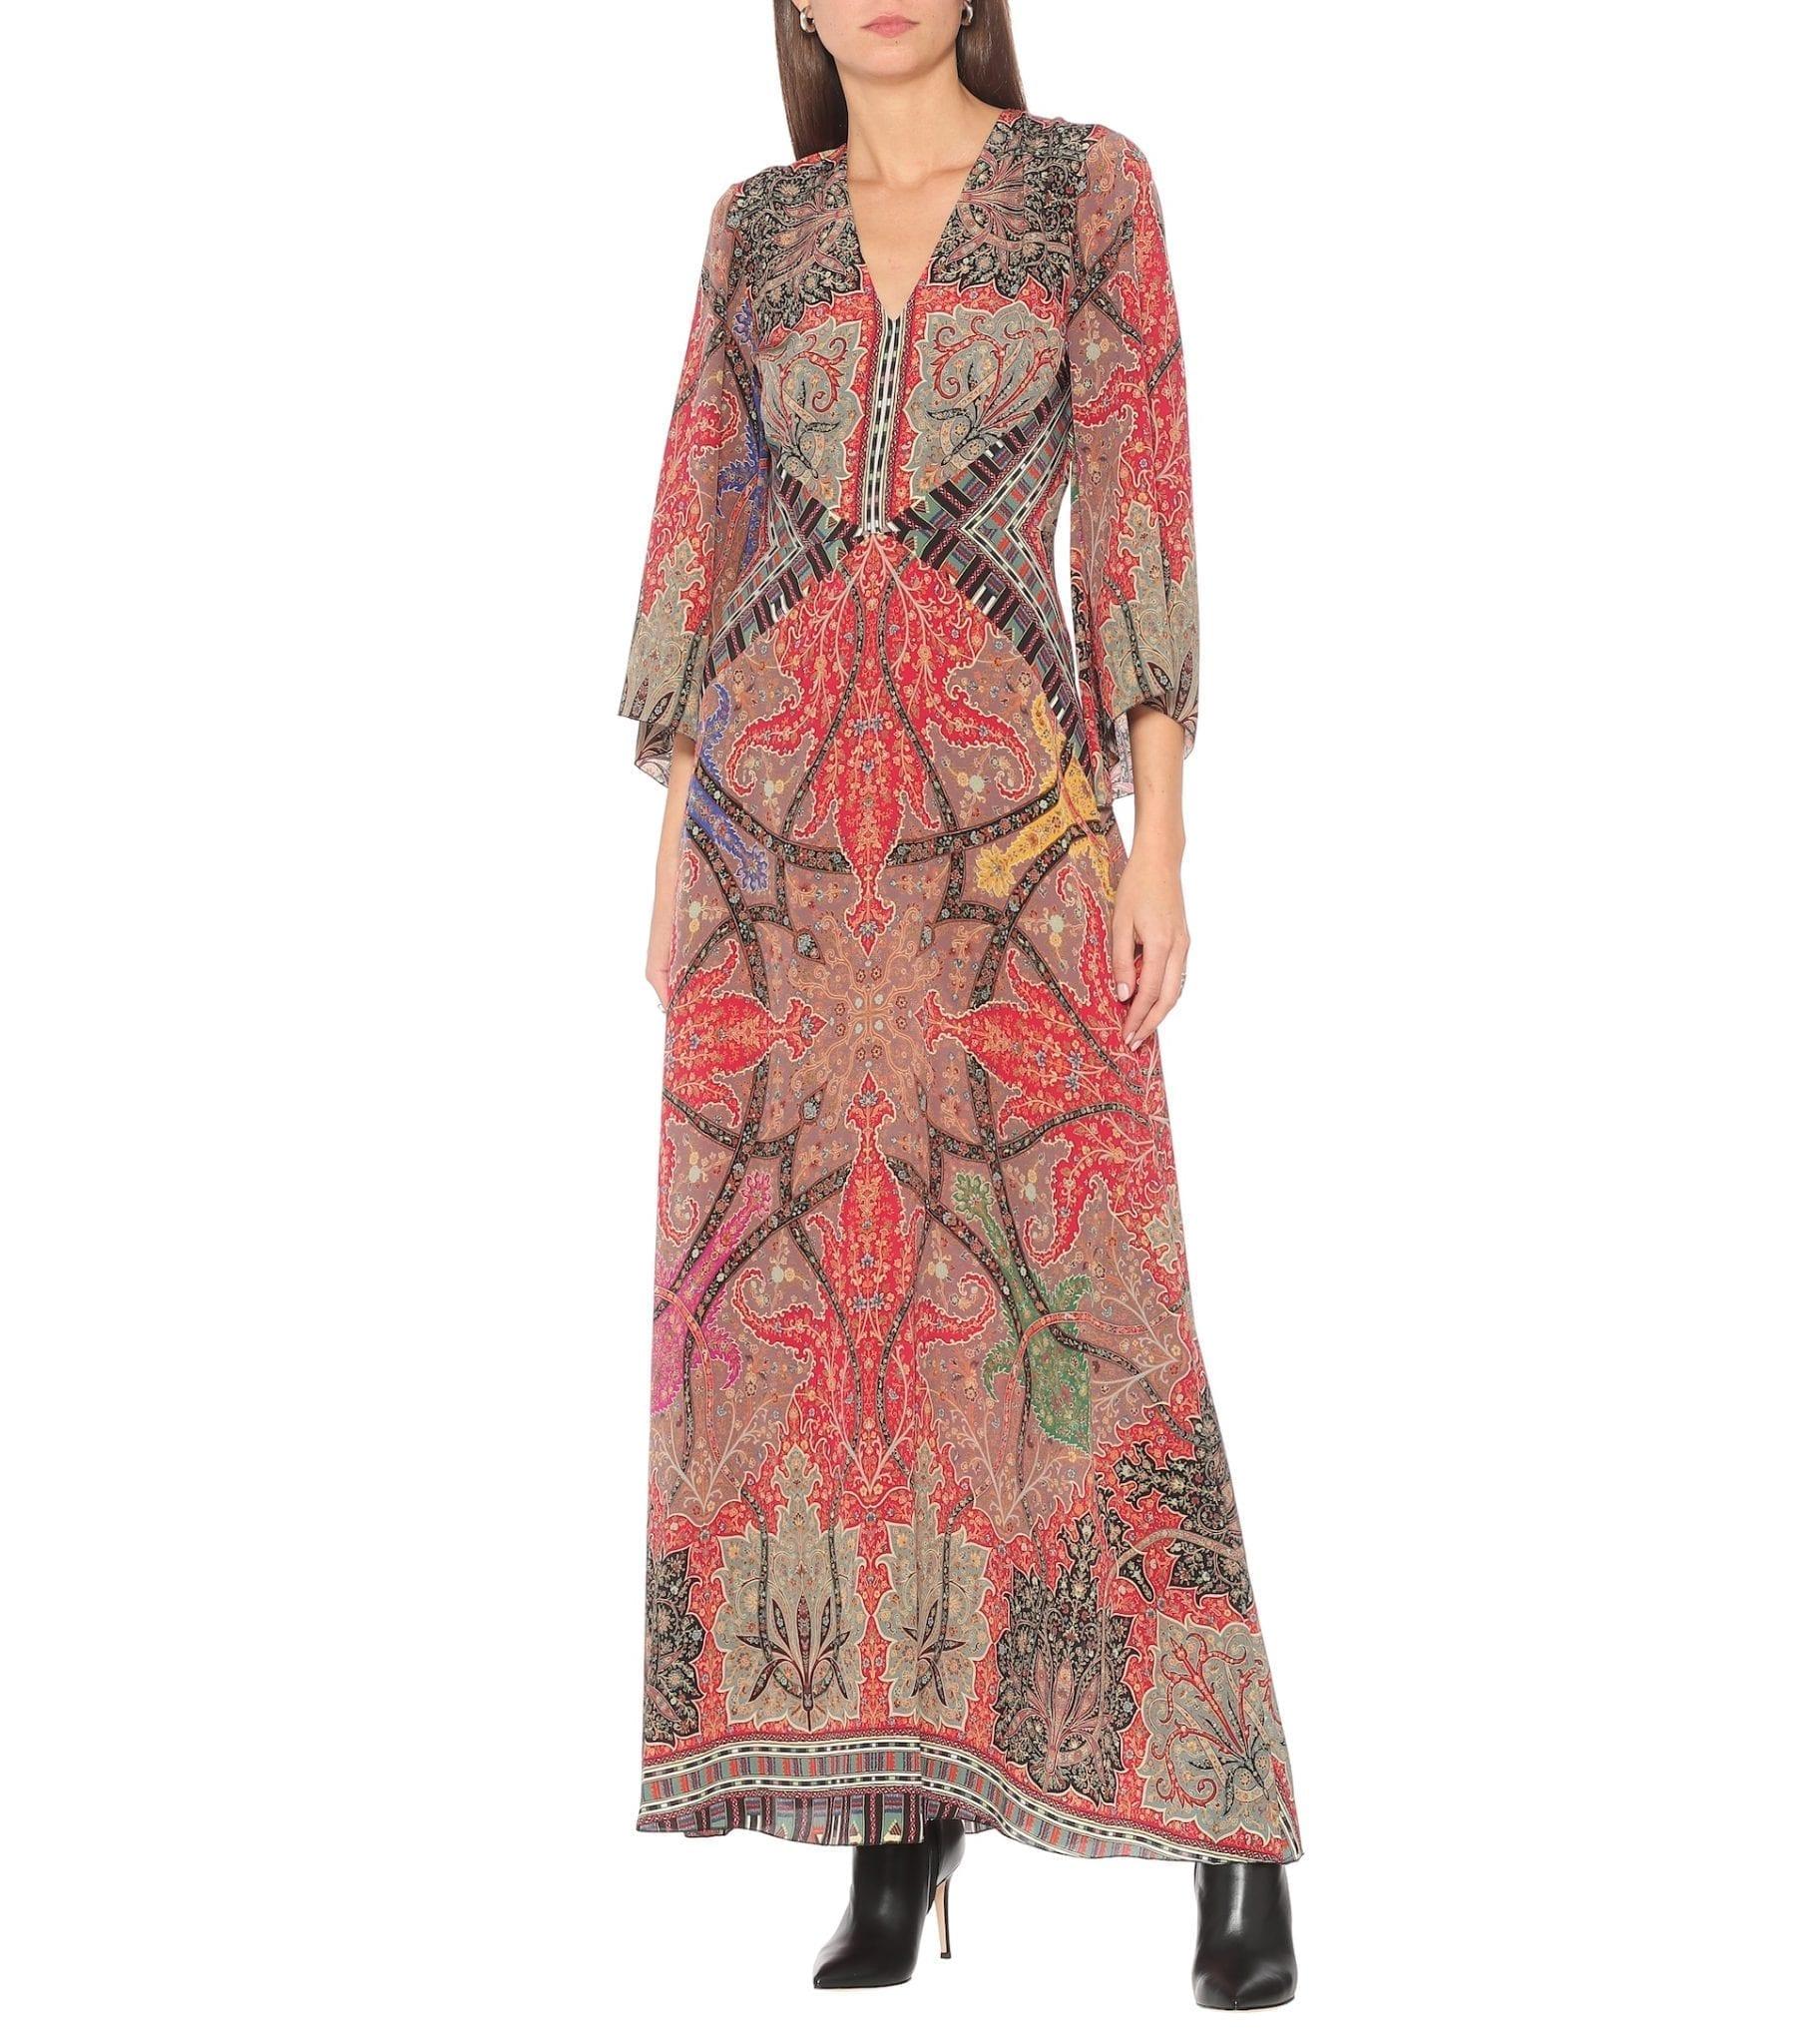 ETRO Printed Silk Georgette Gown